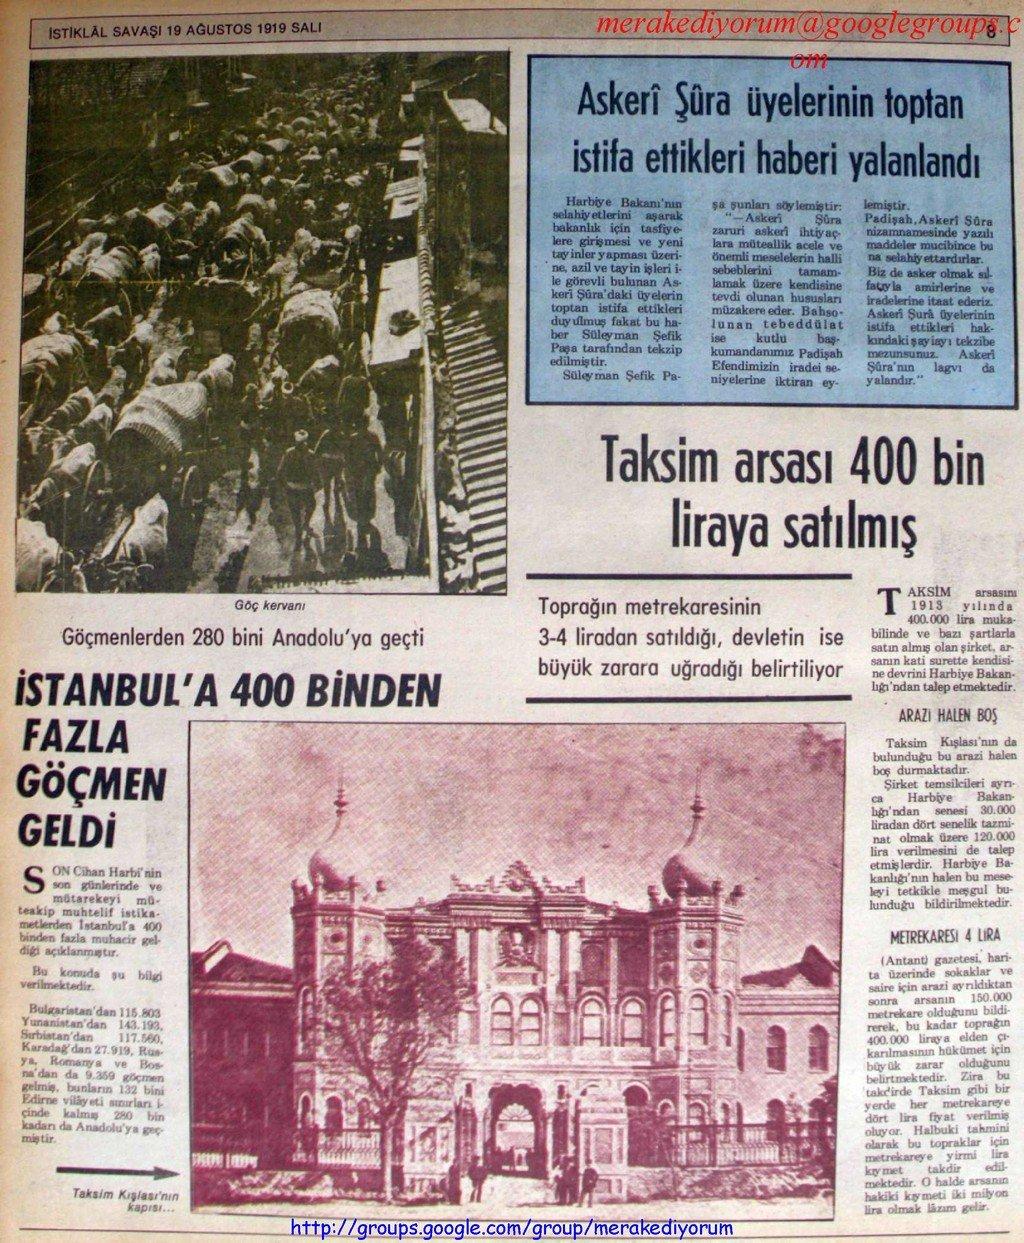 istiklal savaşı gazetesi - 19 ağustos 1919